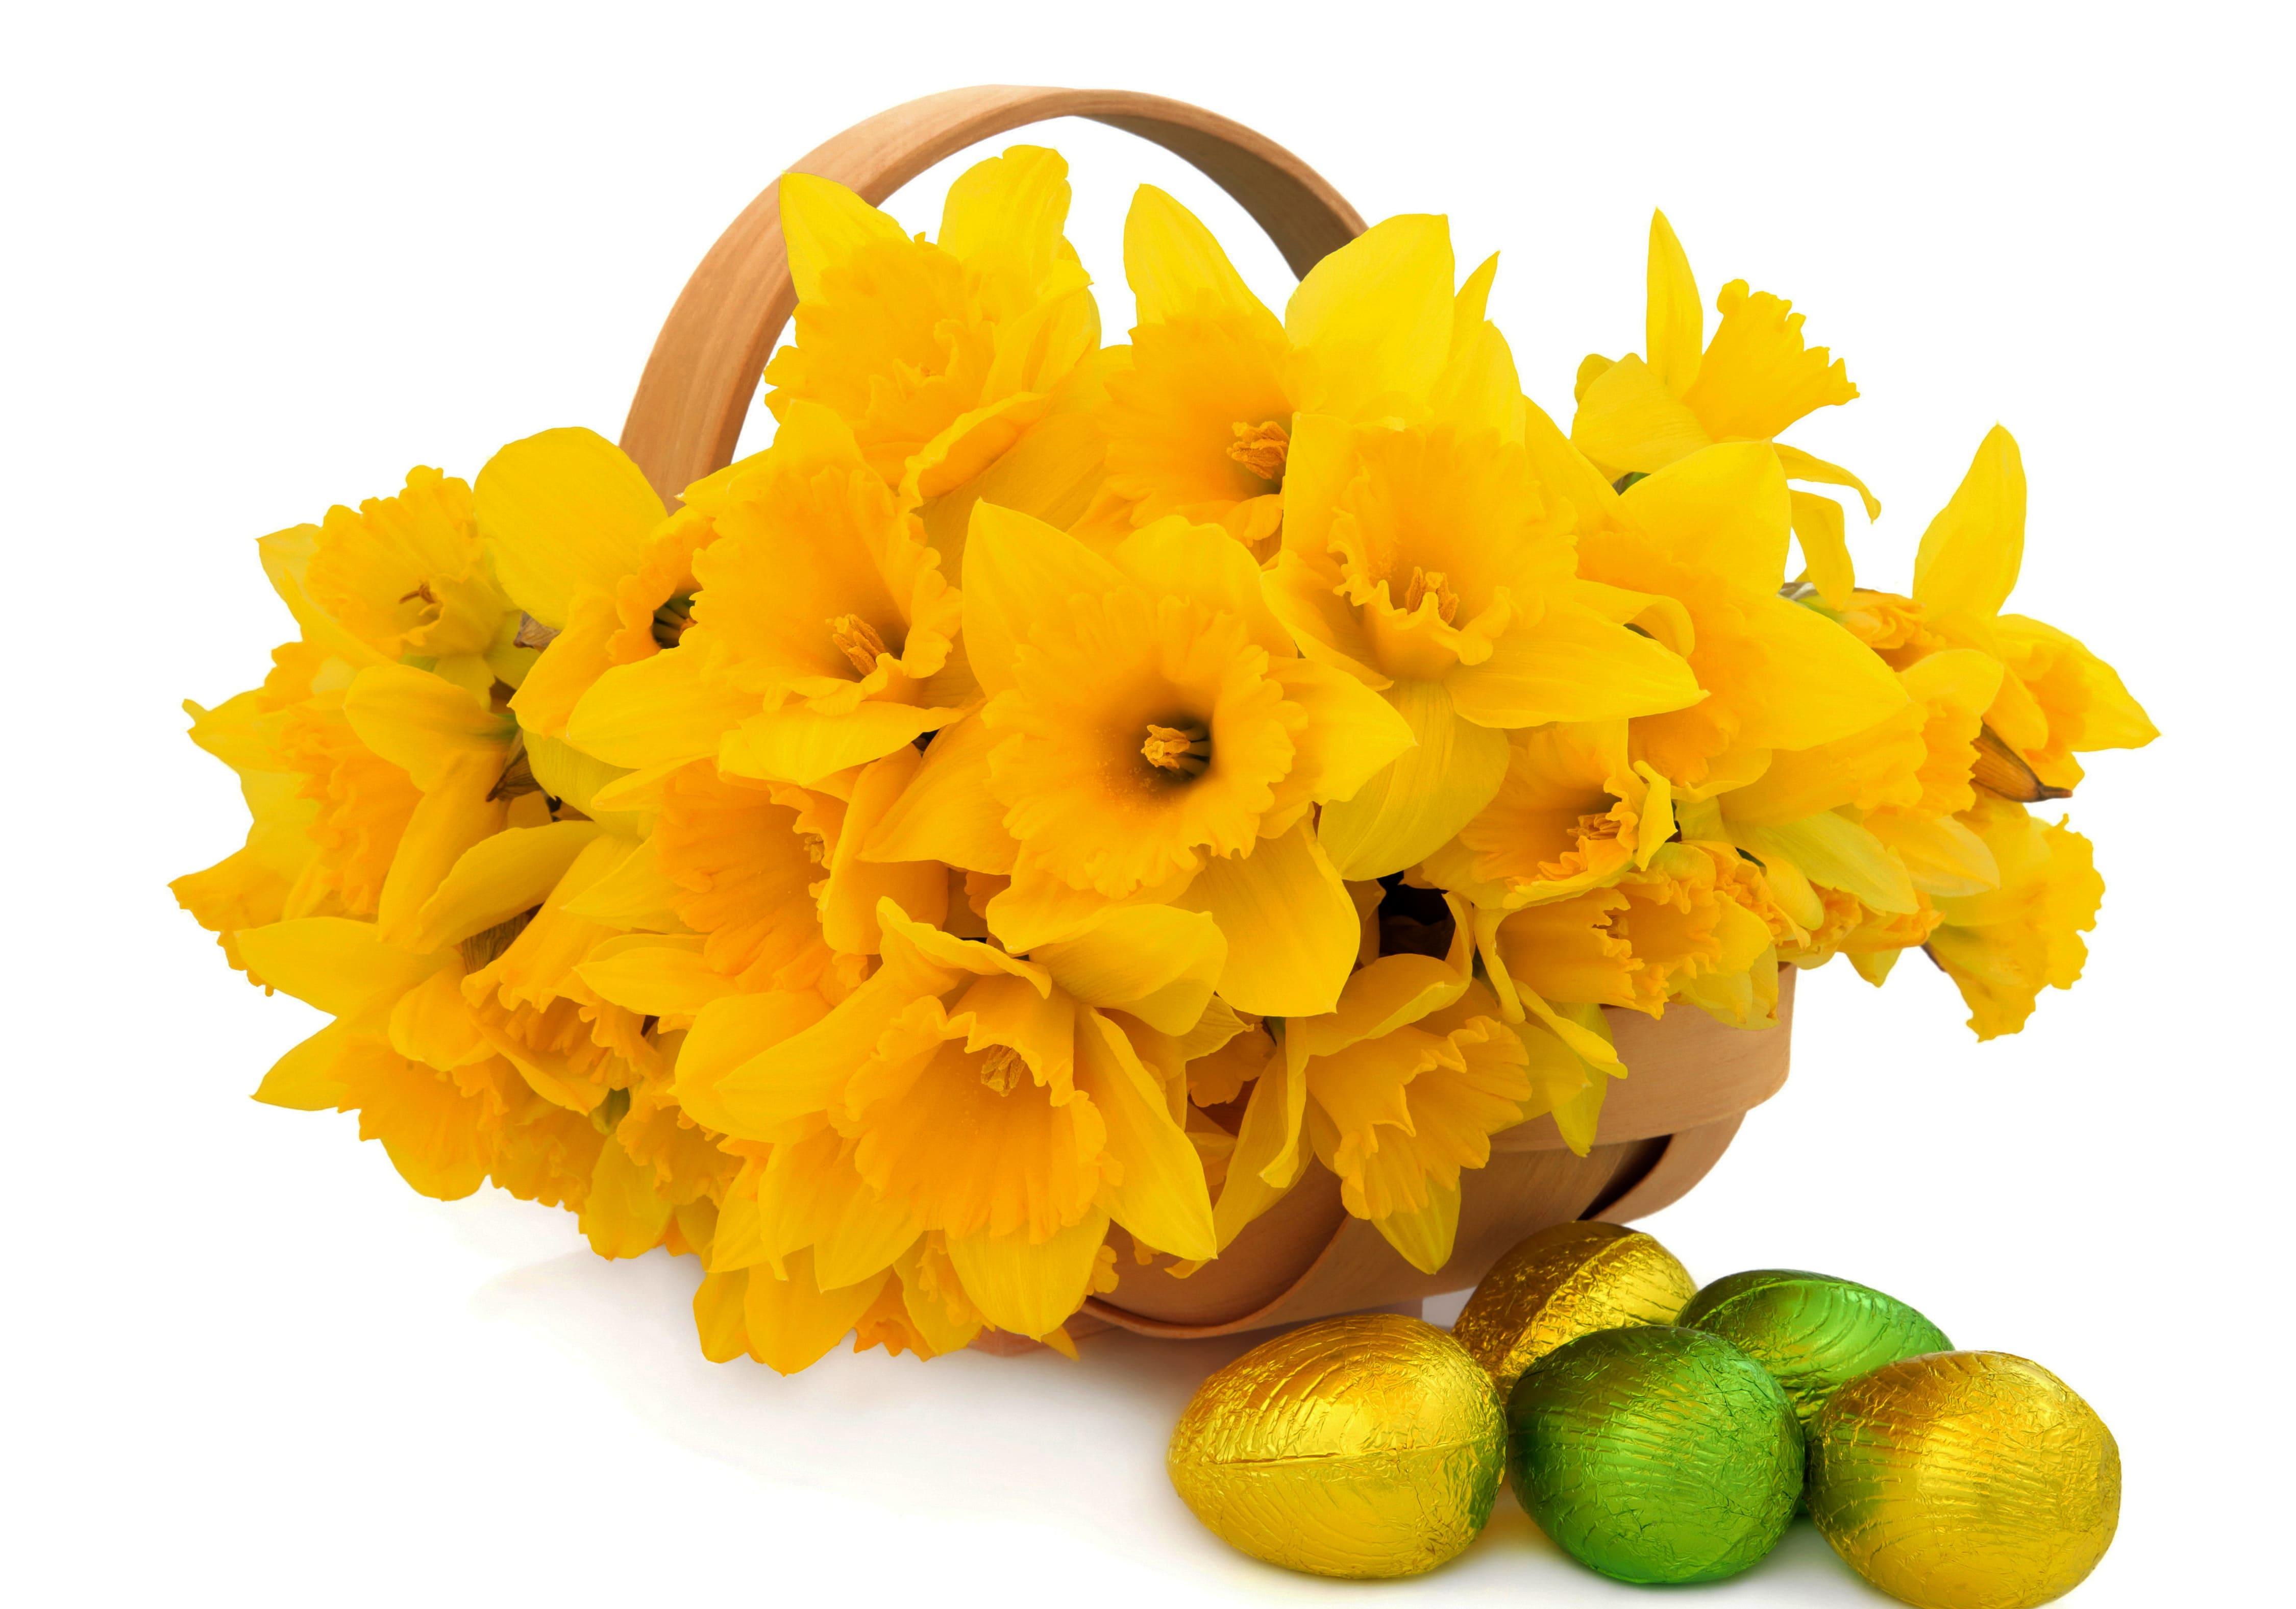 daffodils-photo-20